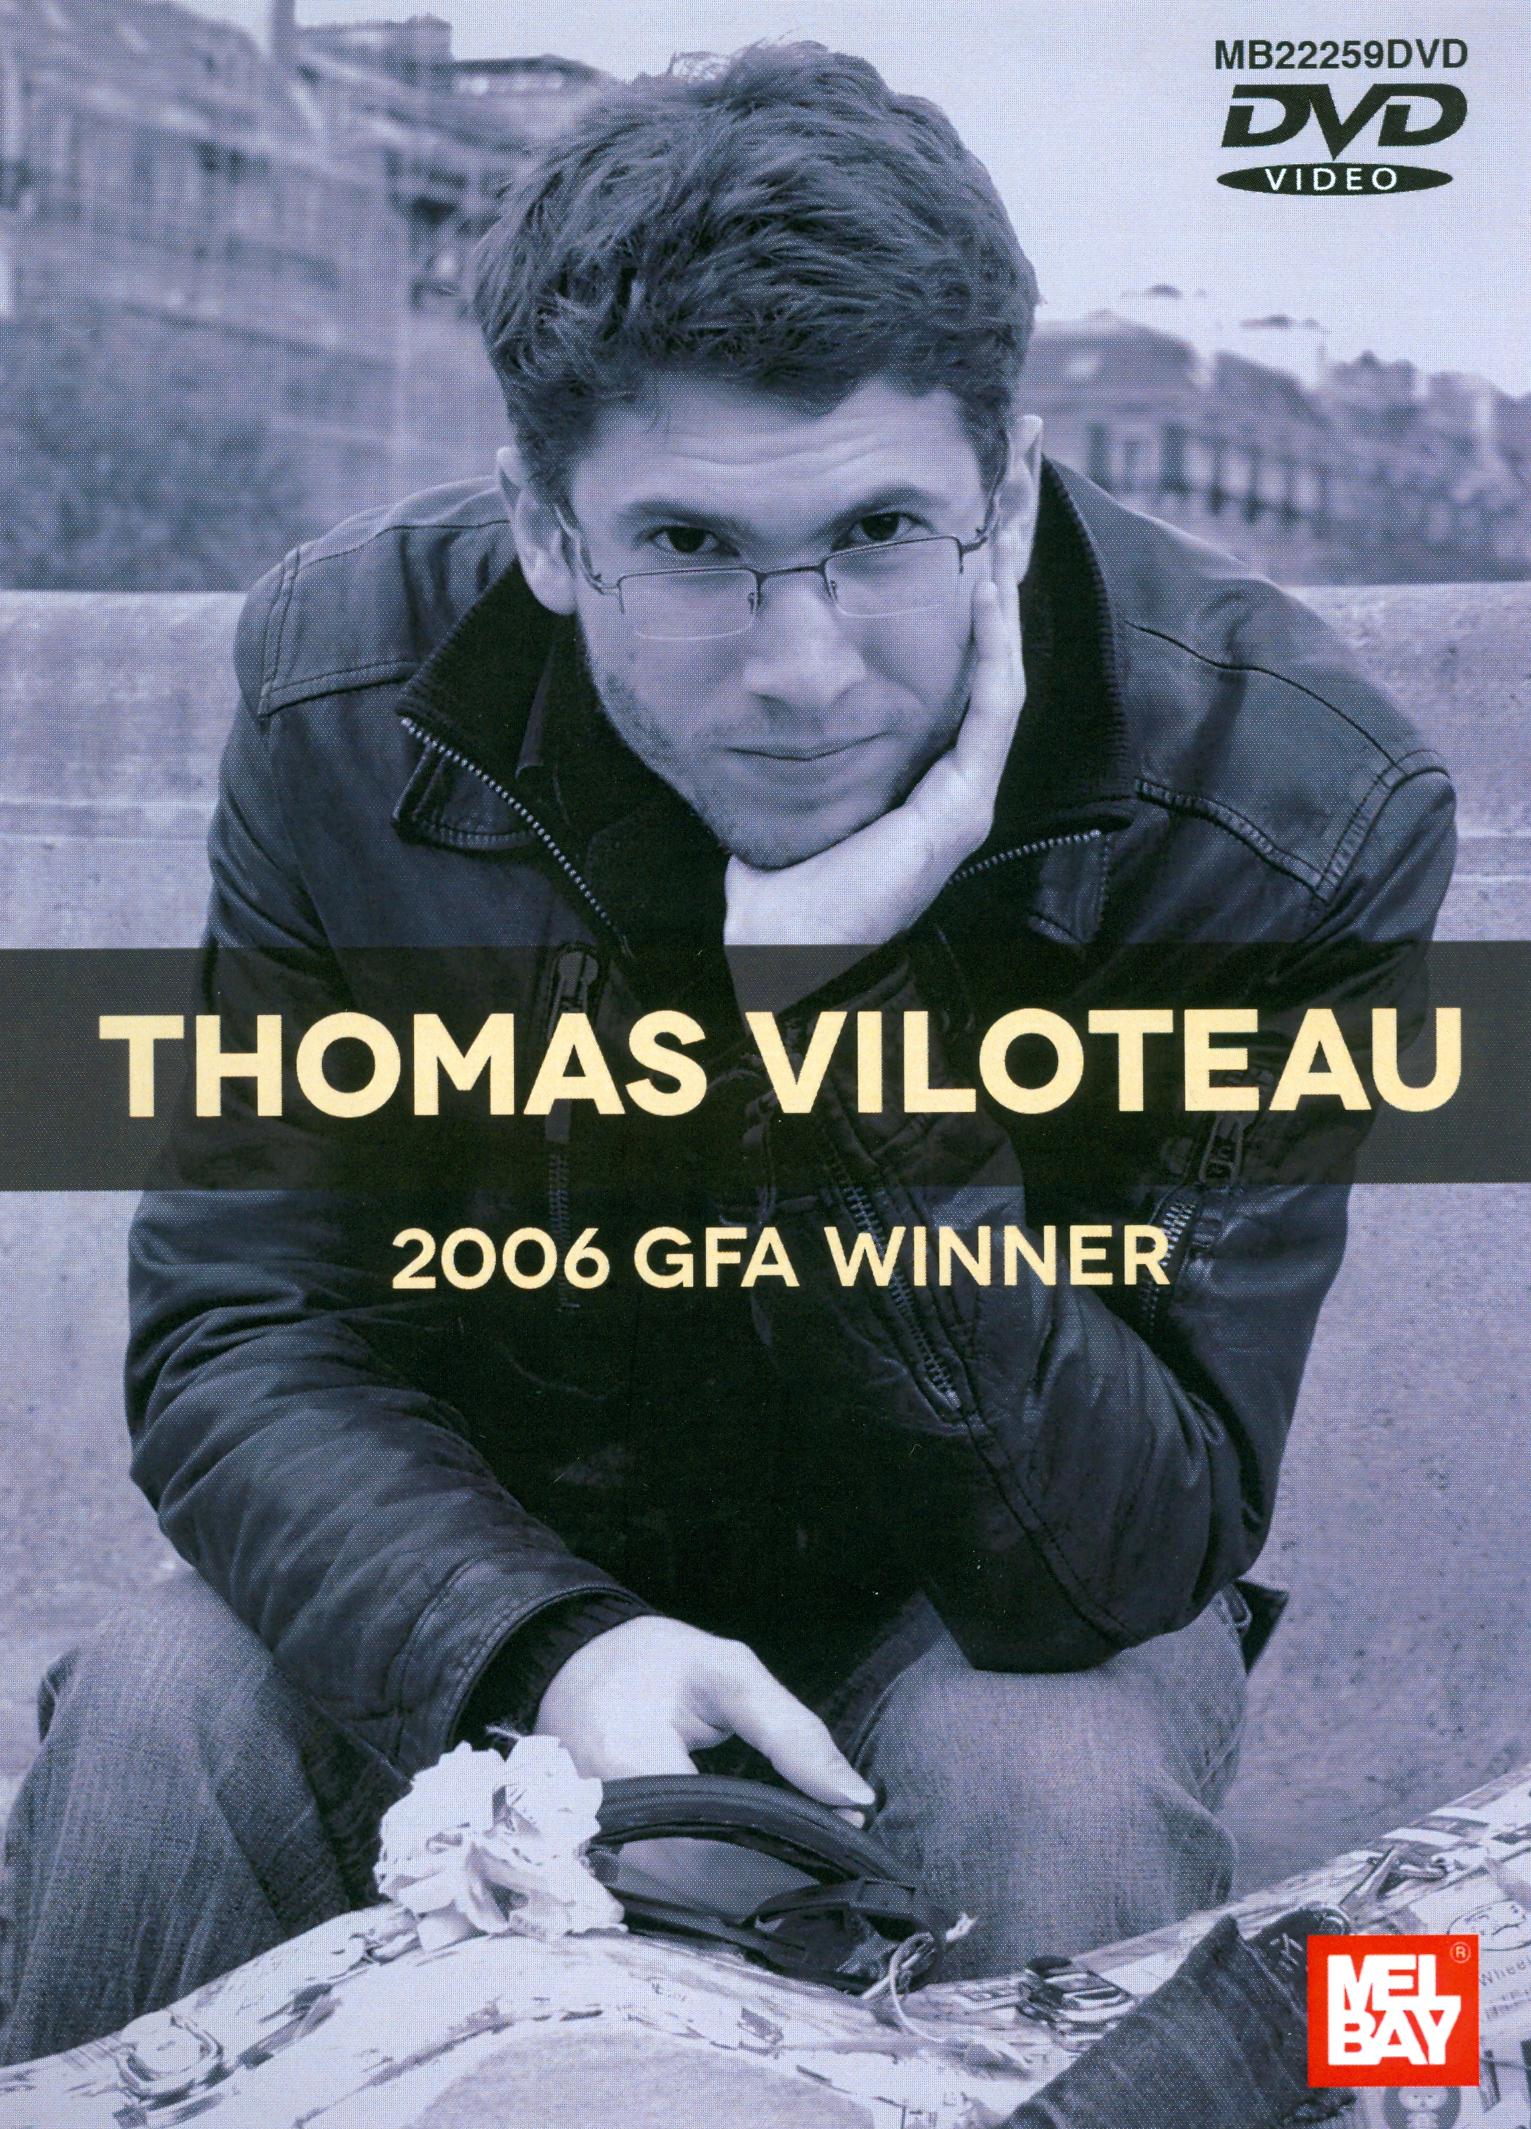 Thomas Viloteau: 2006 GFA Winner